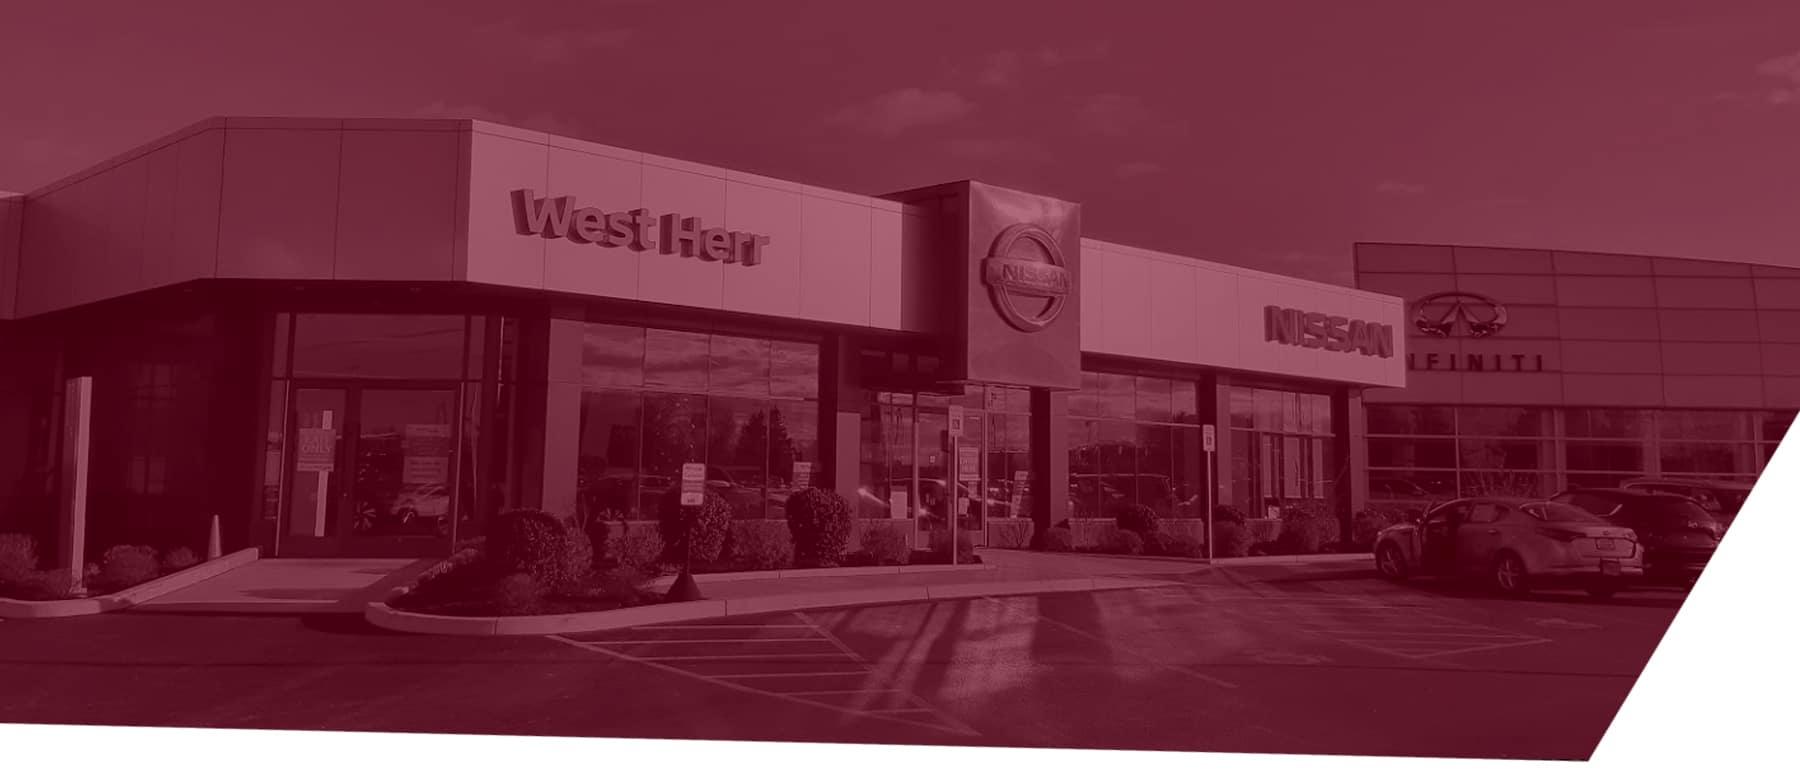 west herr nissan dealership red overlay